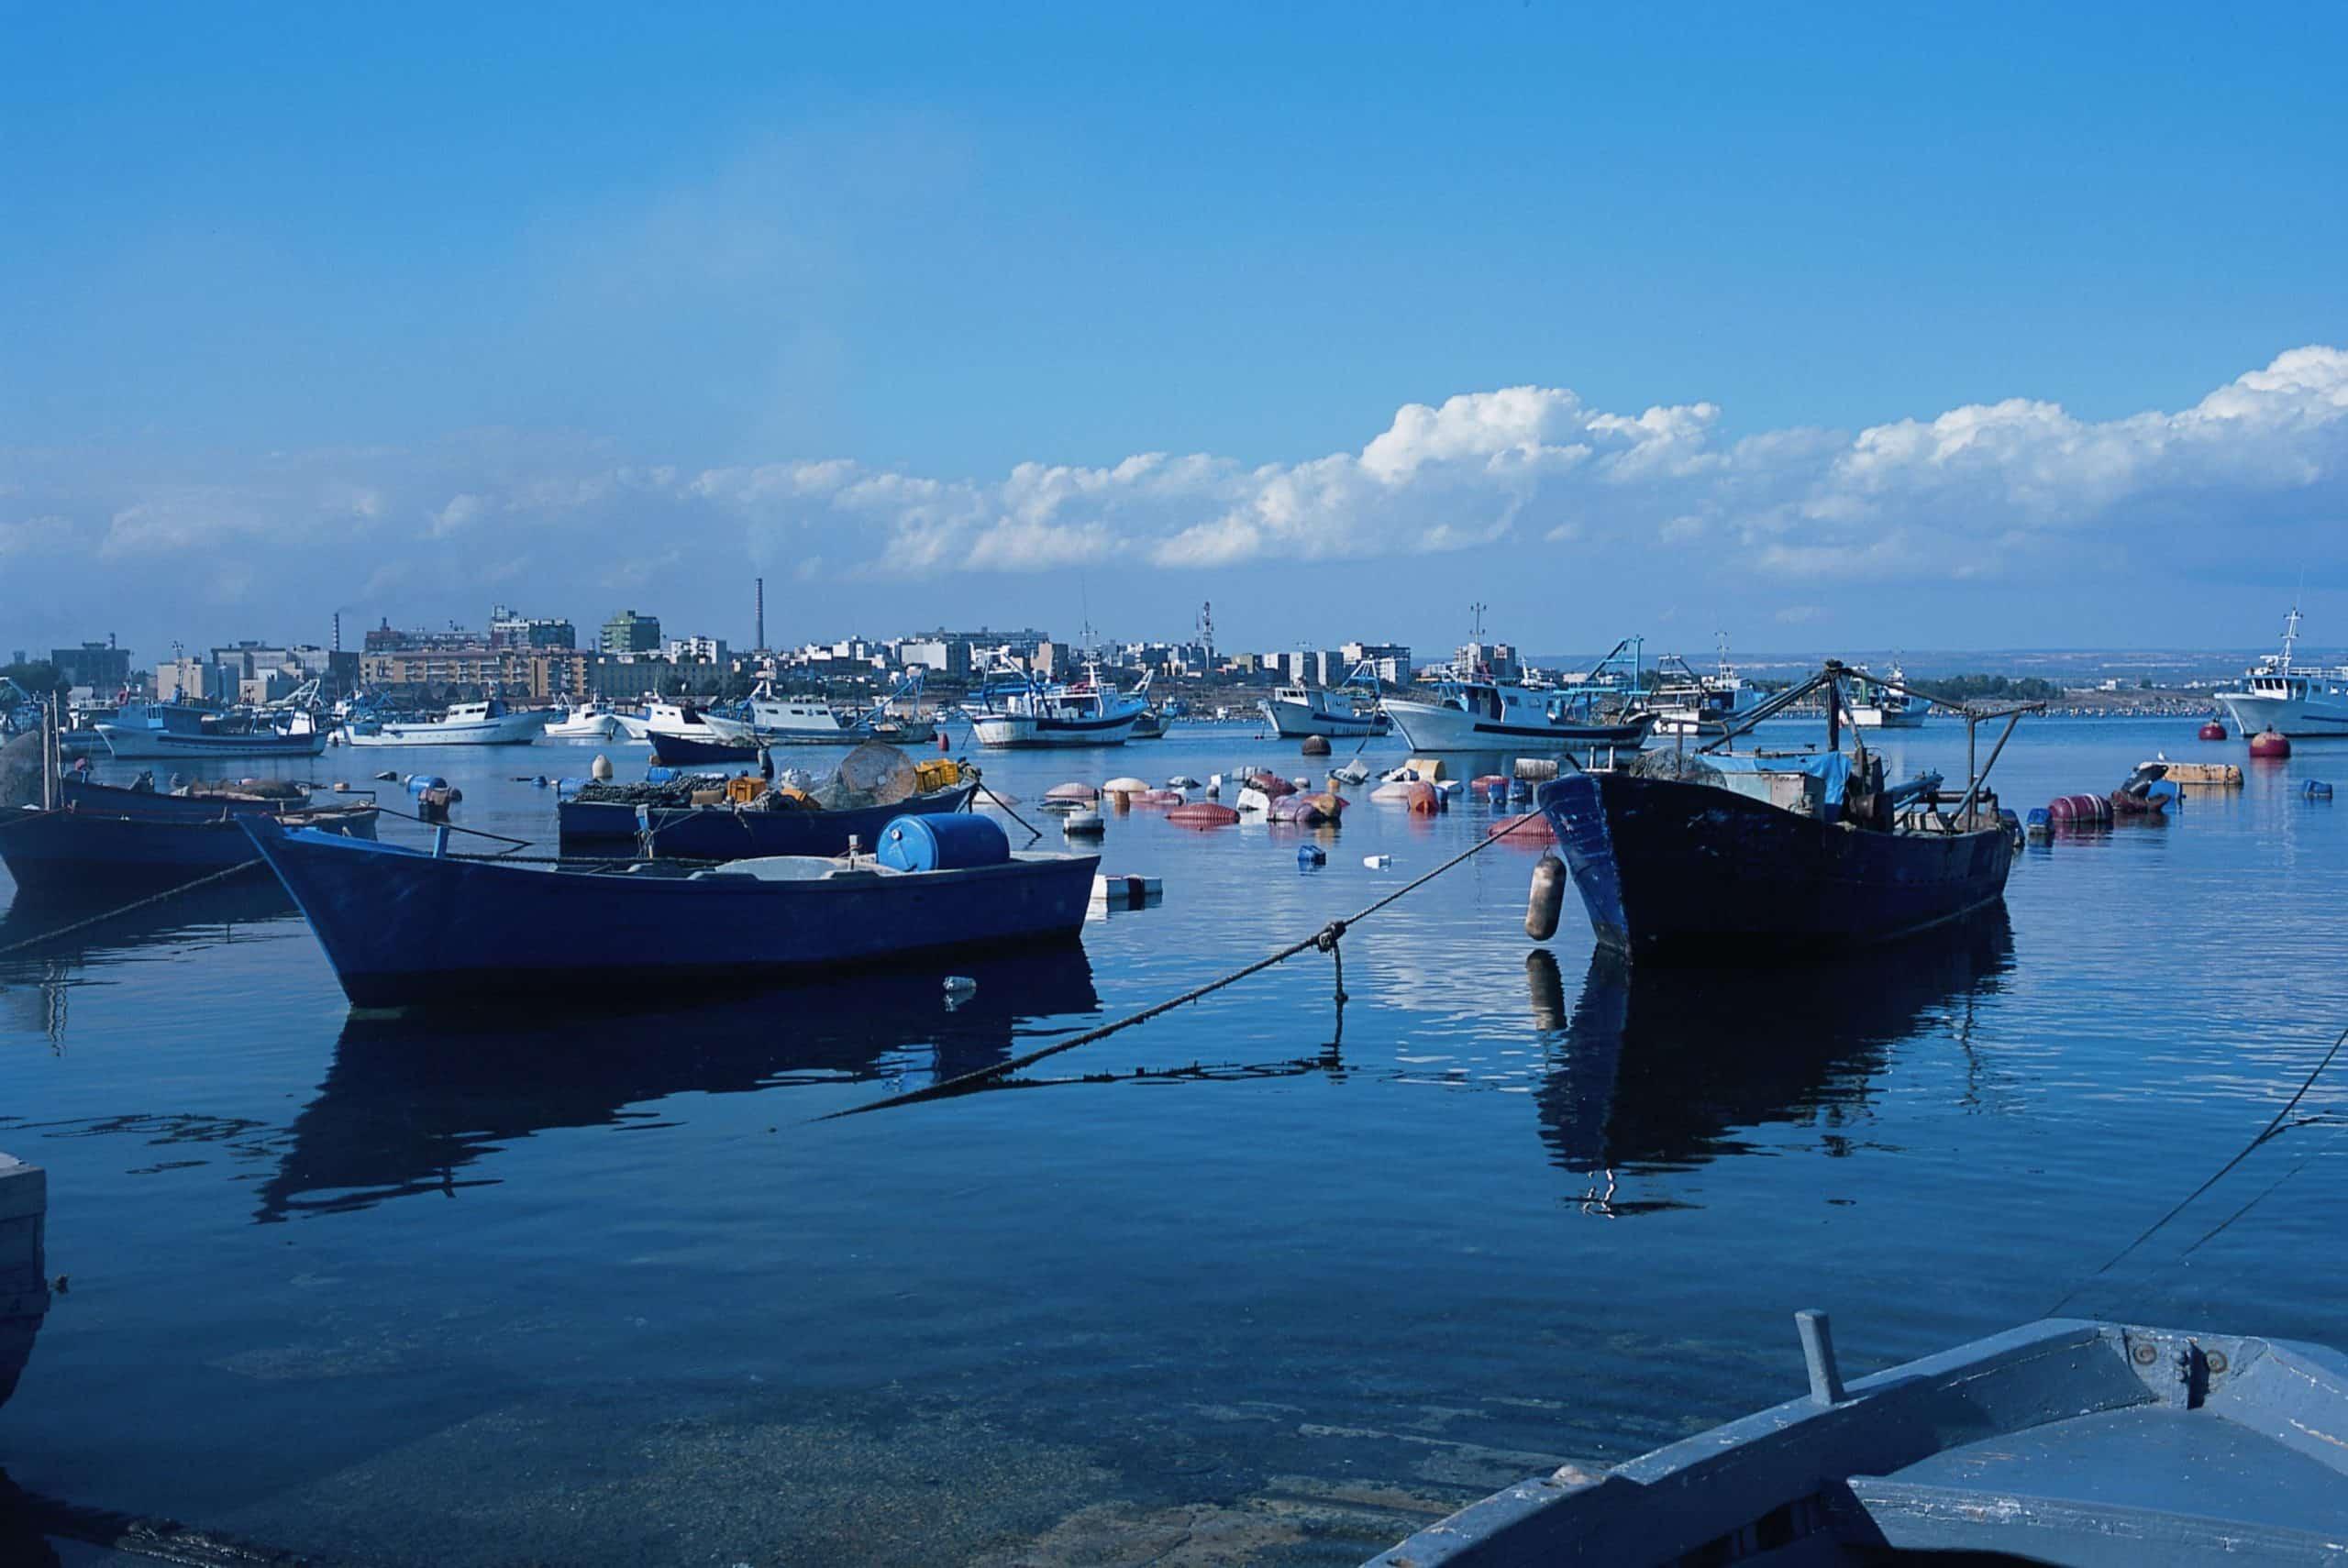 Taranto - Mar Piccolo